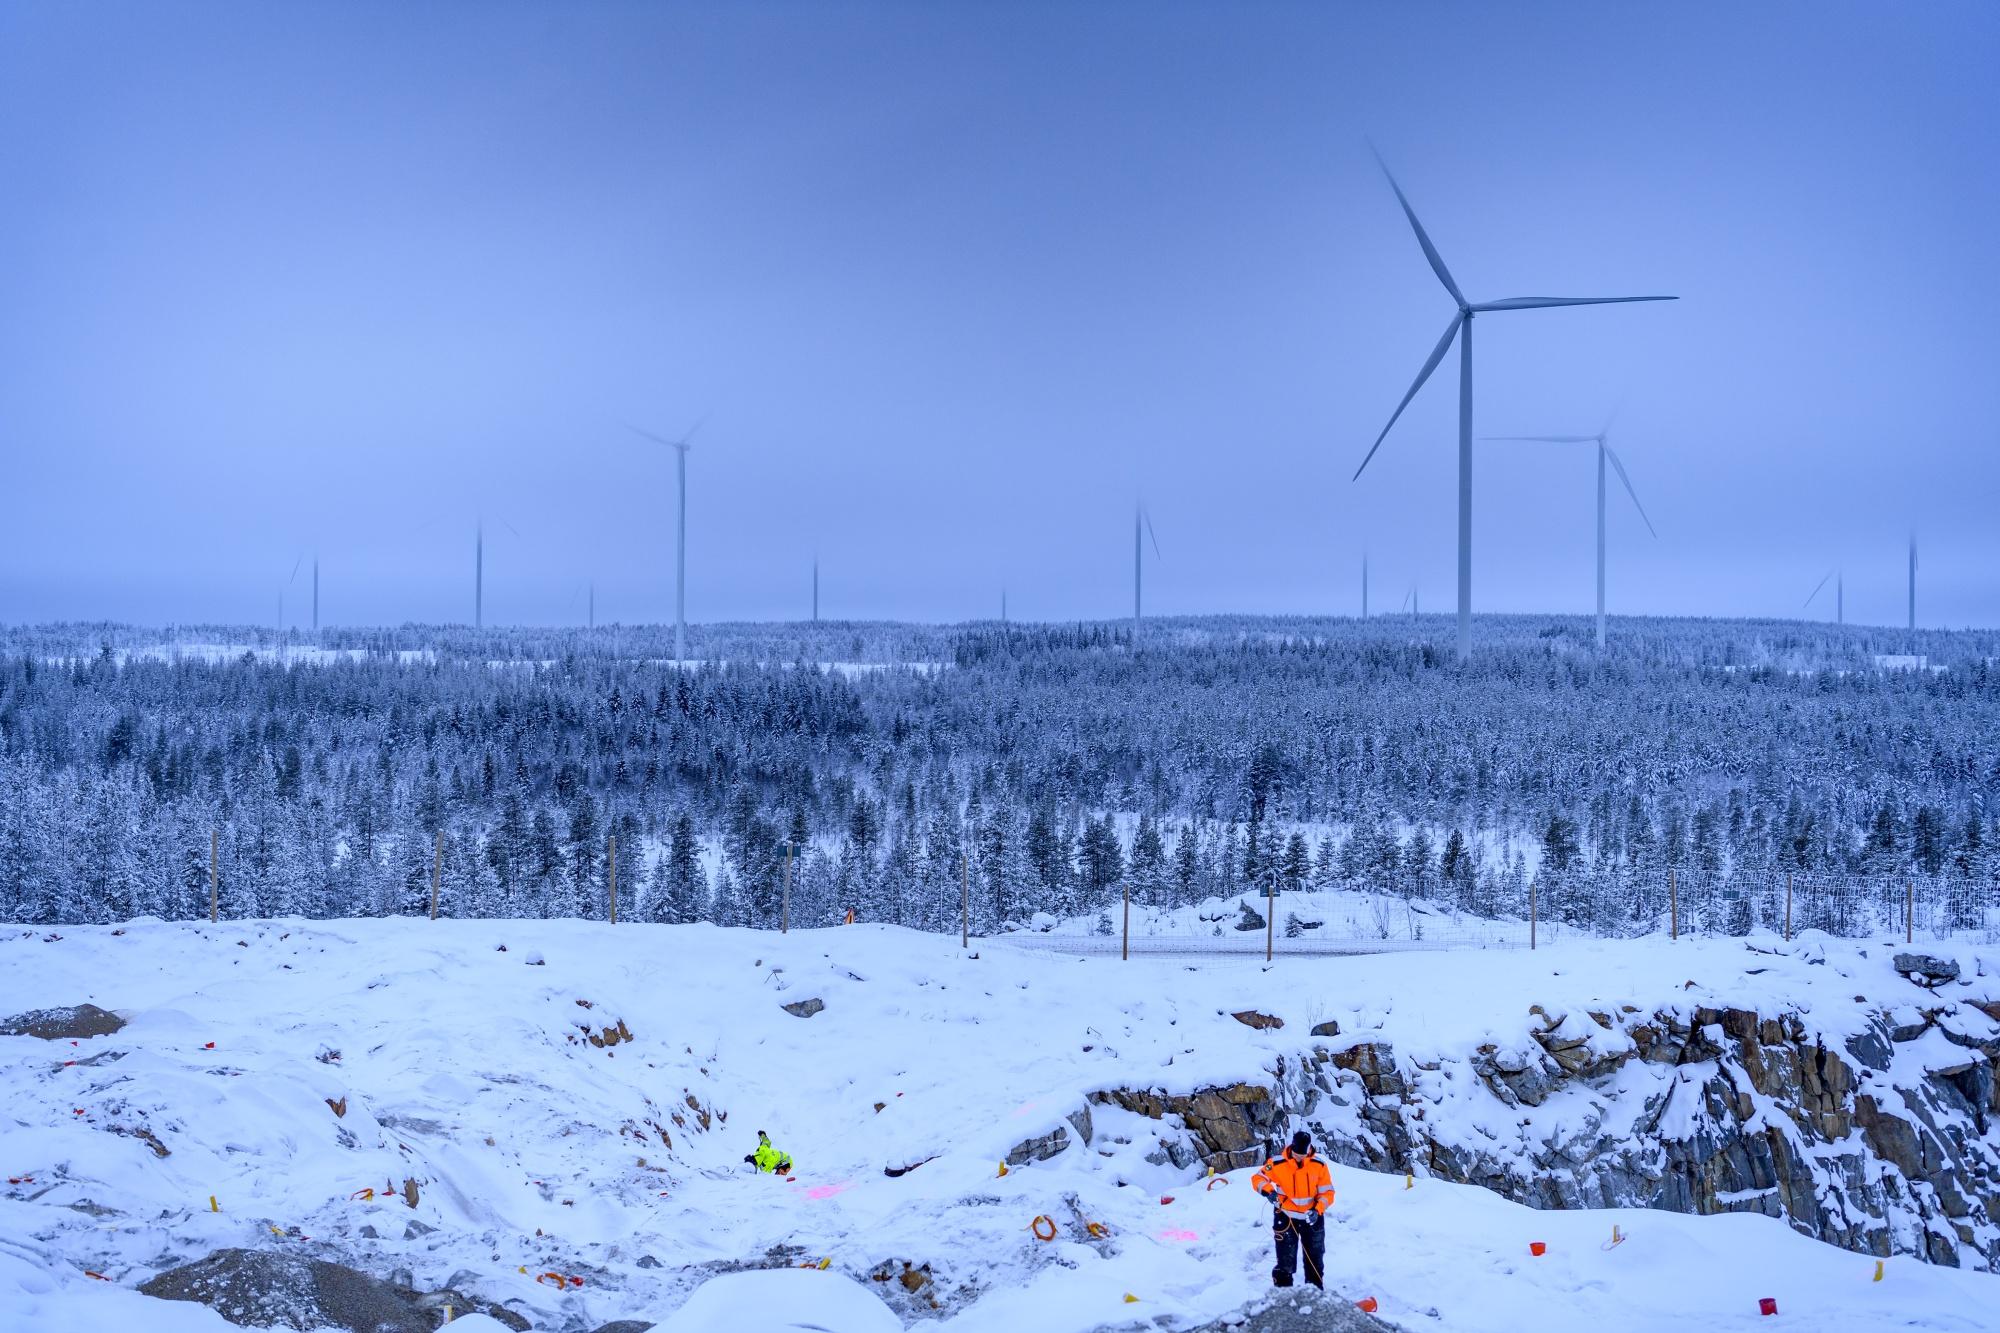 The Markbygden ETT wind park project near Pitea, Sweden.